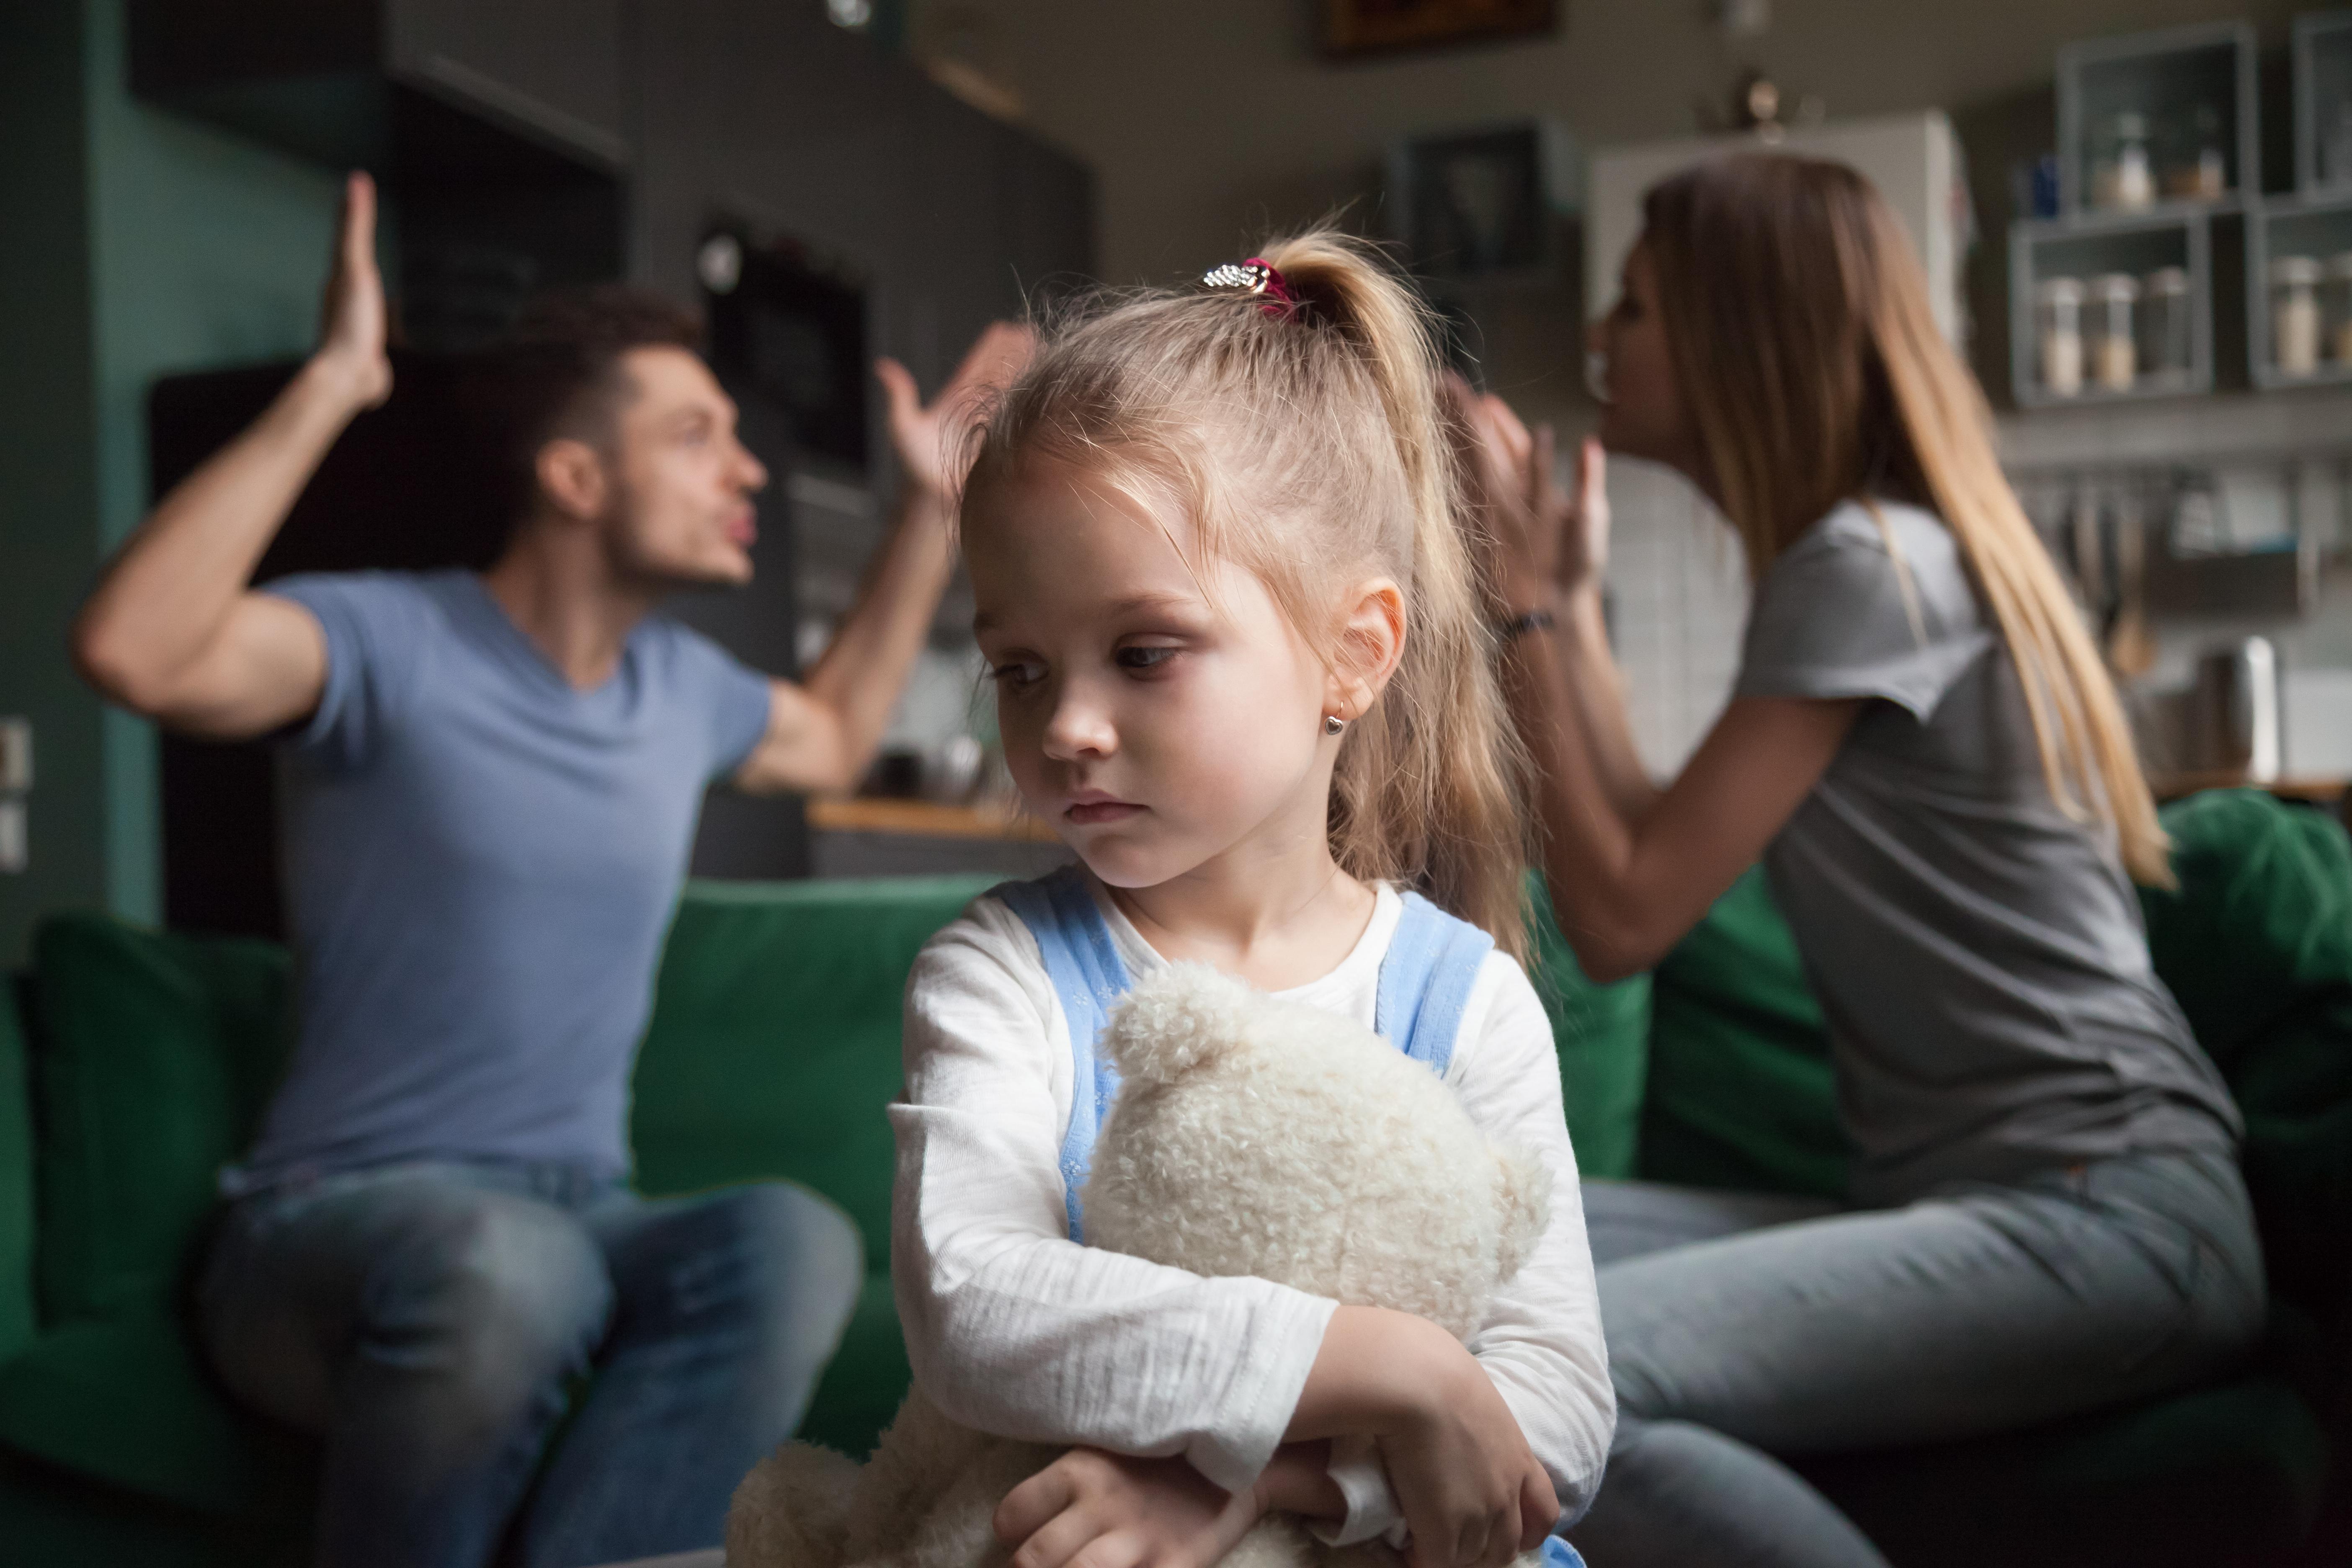 Child Custody Time sharing